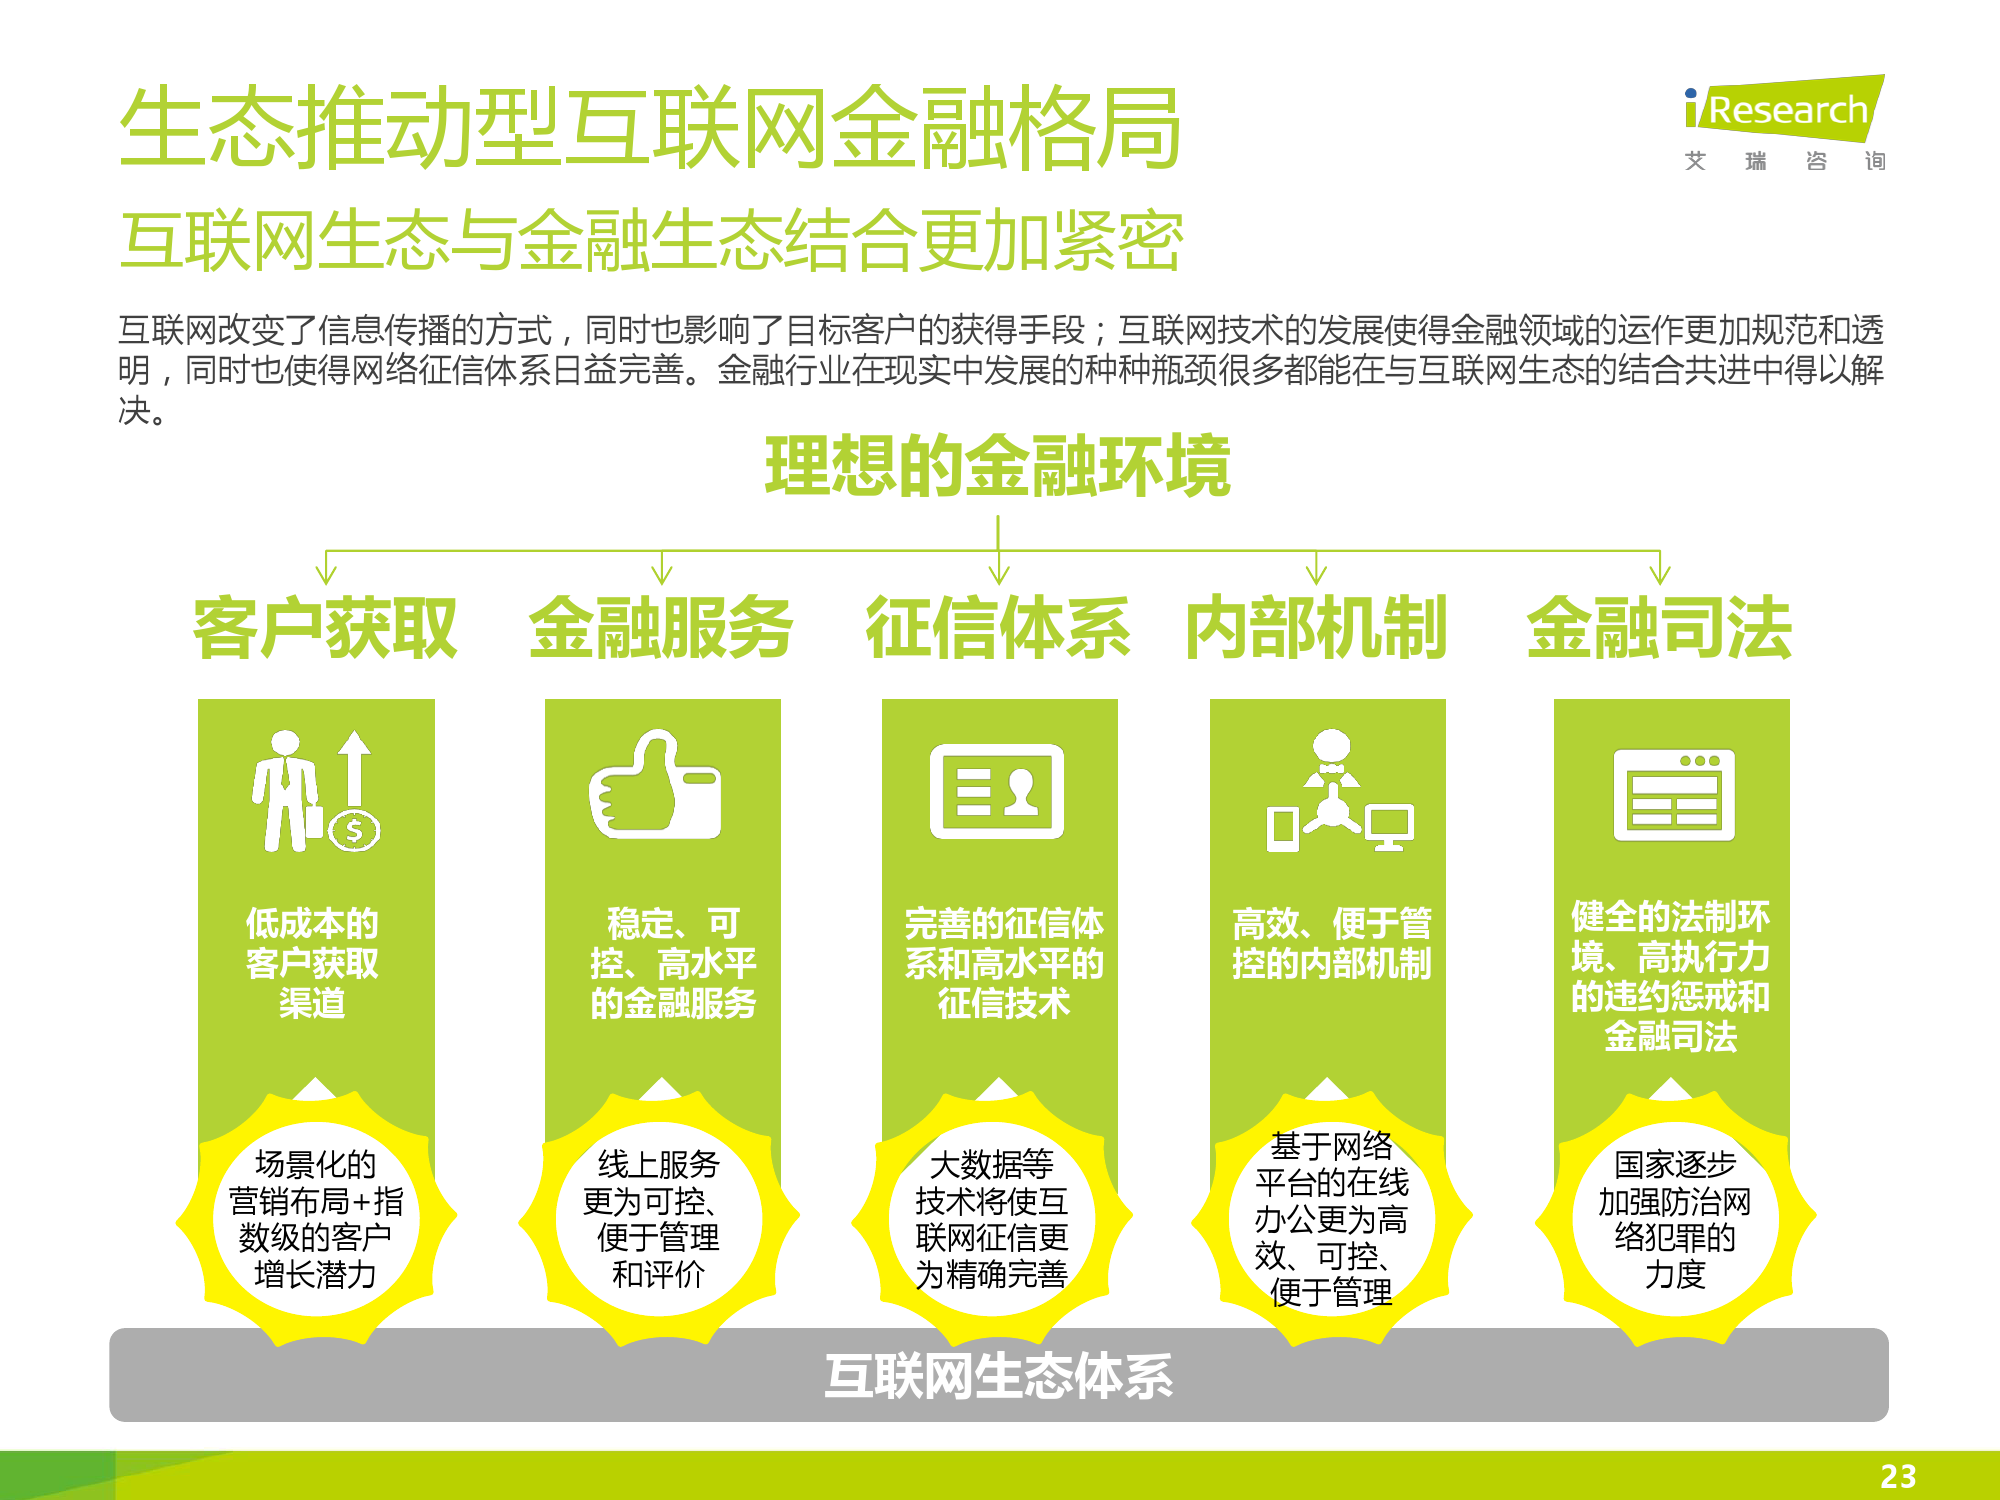 iResearch-2016年中国互联网消费金融市场研究报告_000023